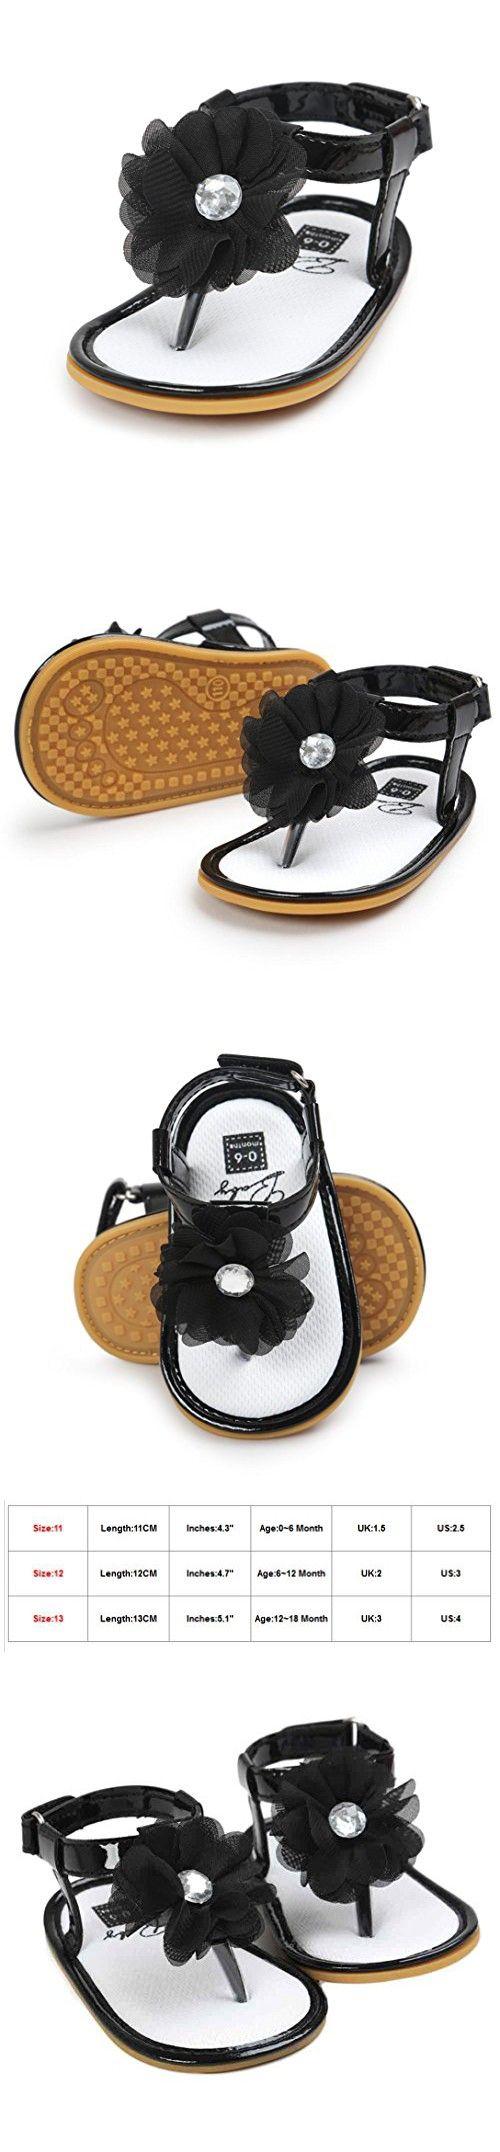 Black newborn sandals - Voberry Baby Infant Girls Flower Pearl Princess Sandals Soft Sole First Walker Crib Shoes 0